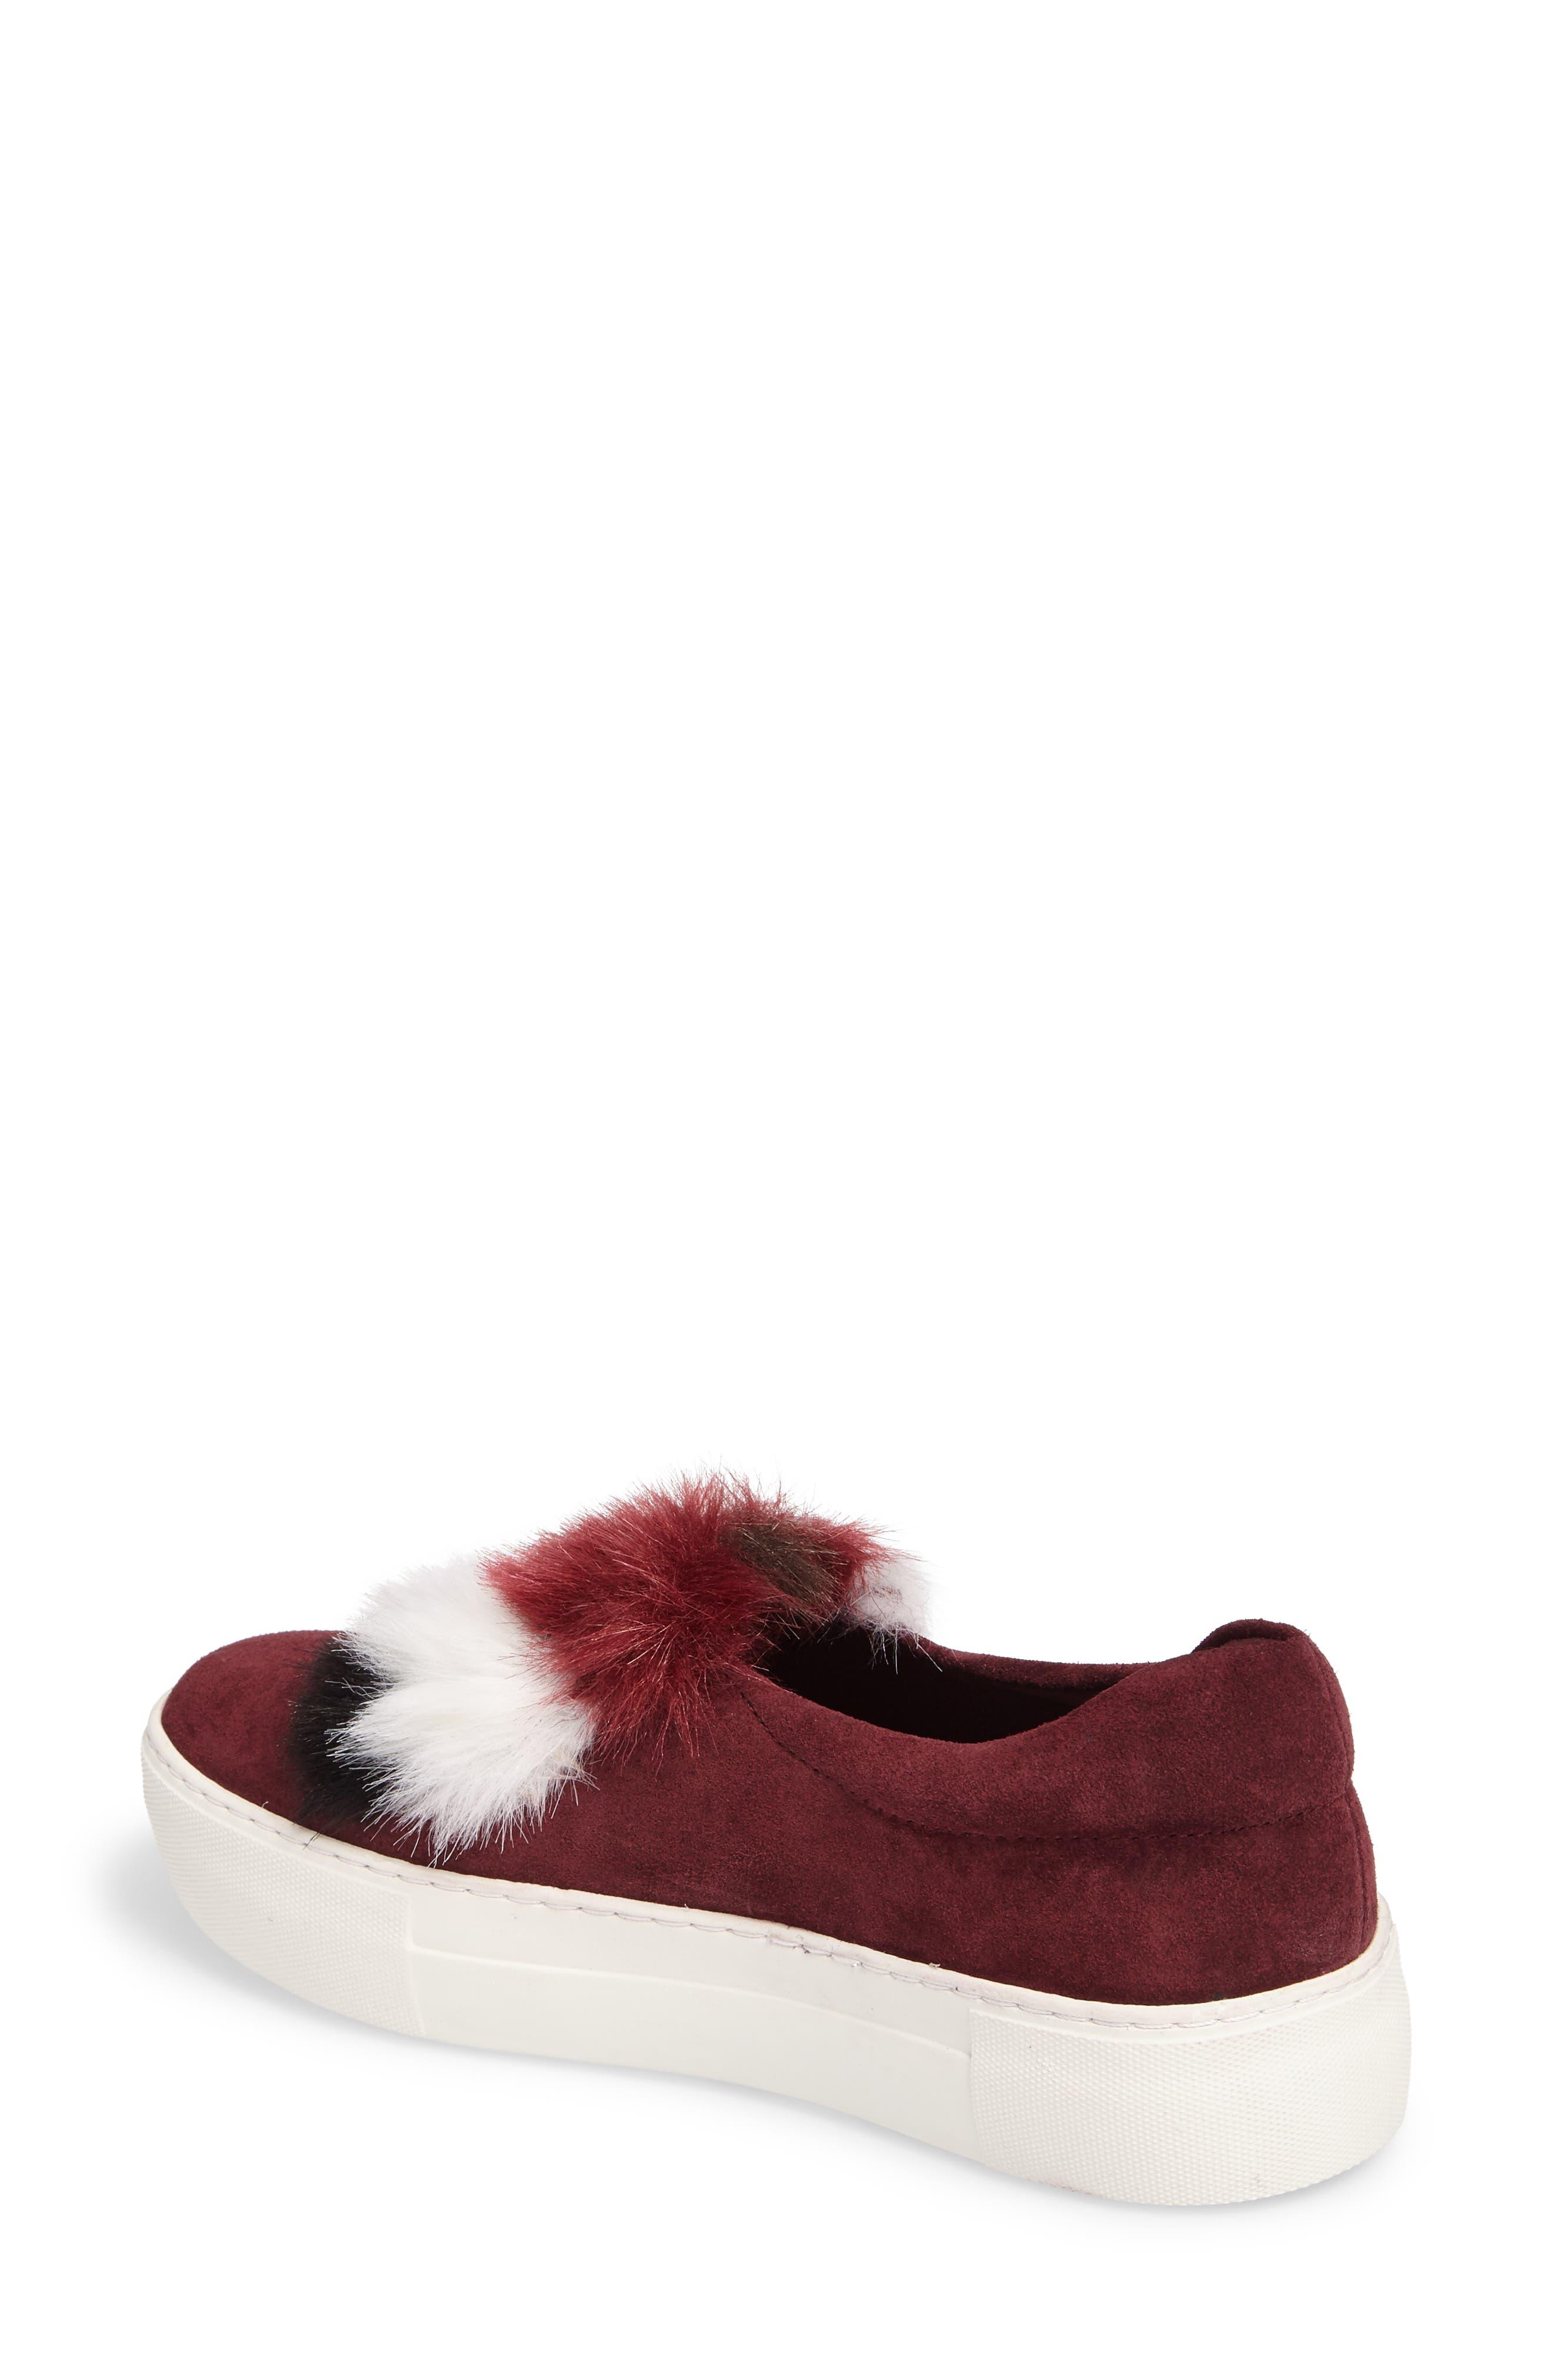 Alexi Faux Fur Slip-On Sneaker,                             Alternate thumbnail 2, color,                             Burgundy Suede